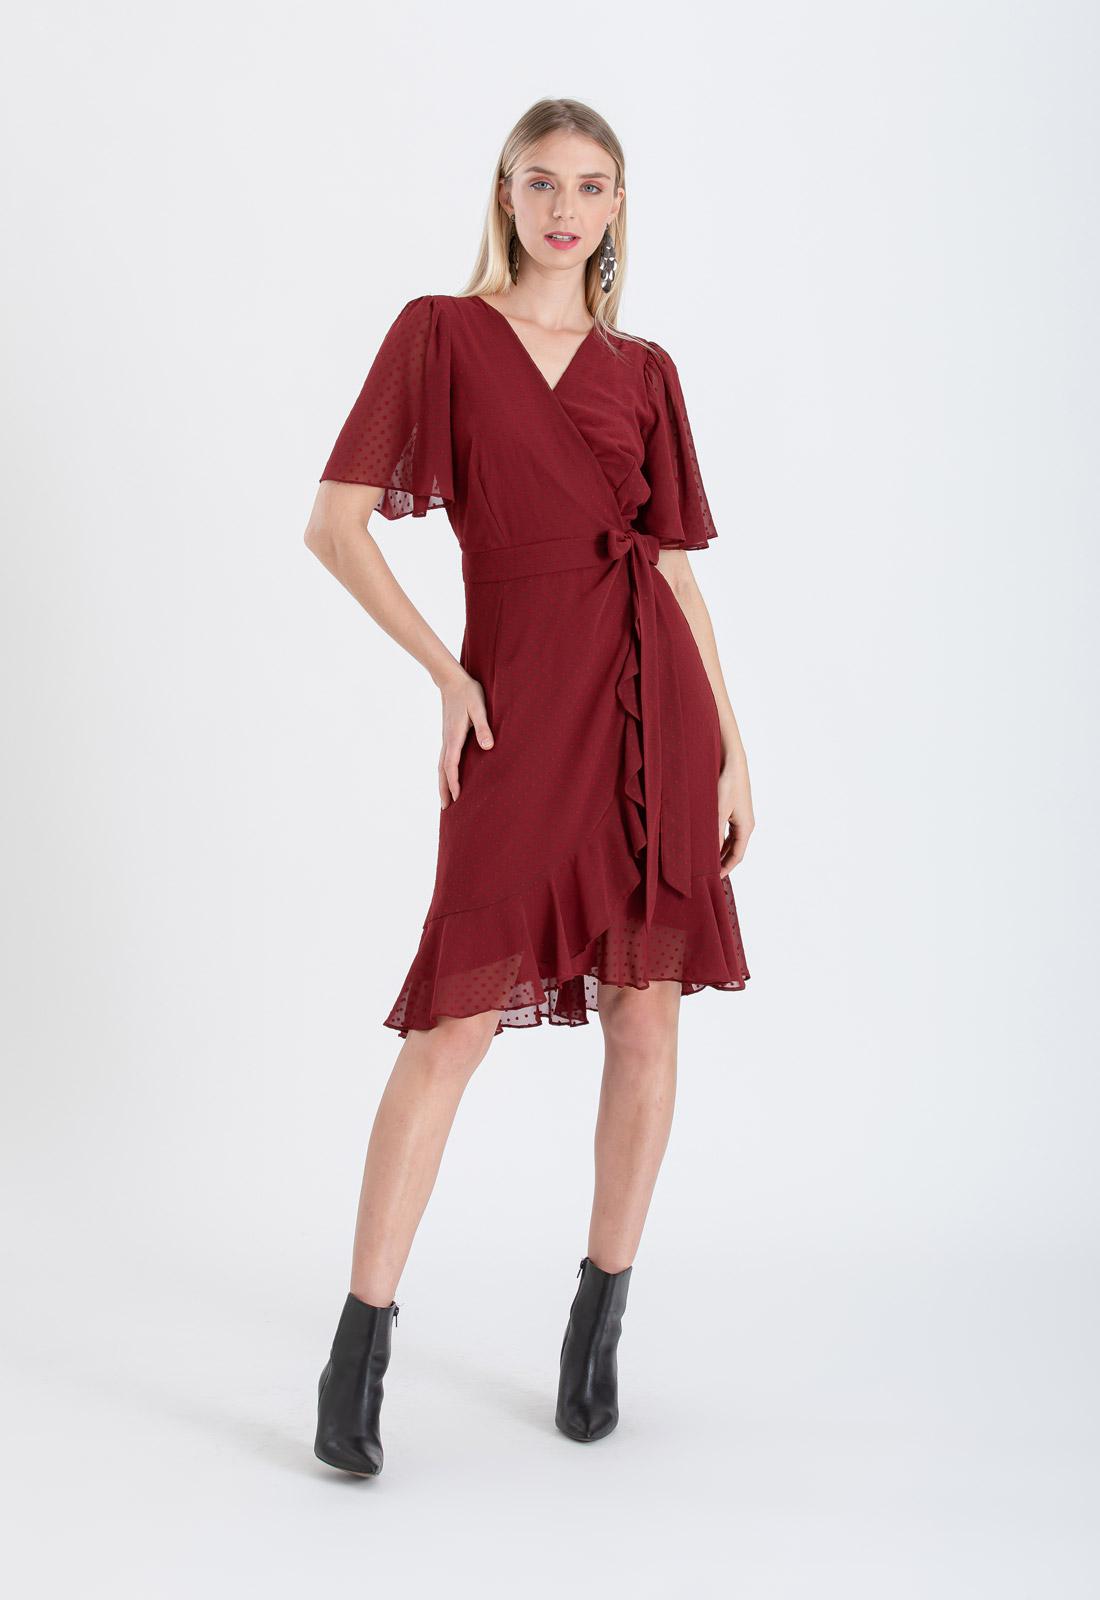 Vestido chemise marsala cachecouer ref. 2673